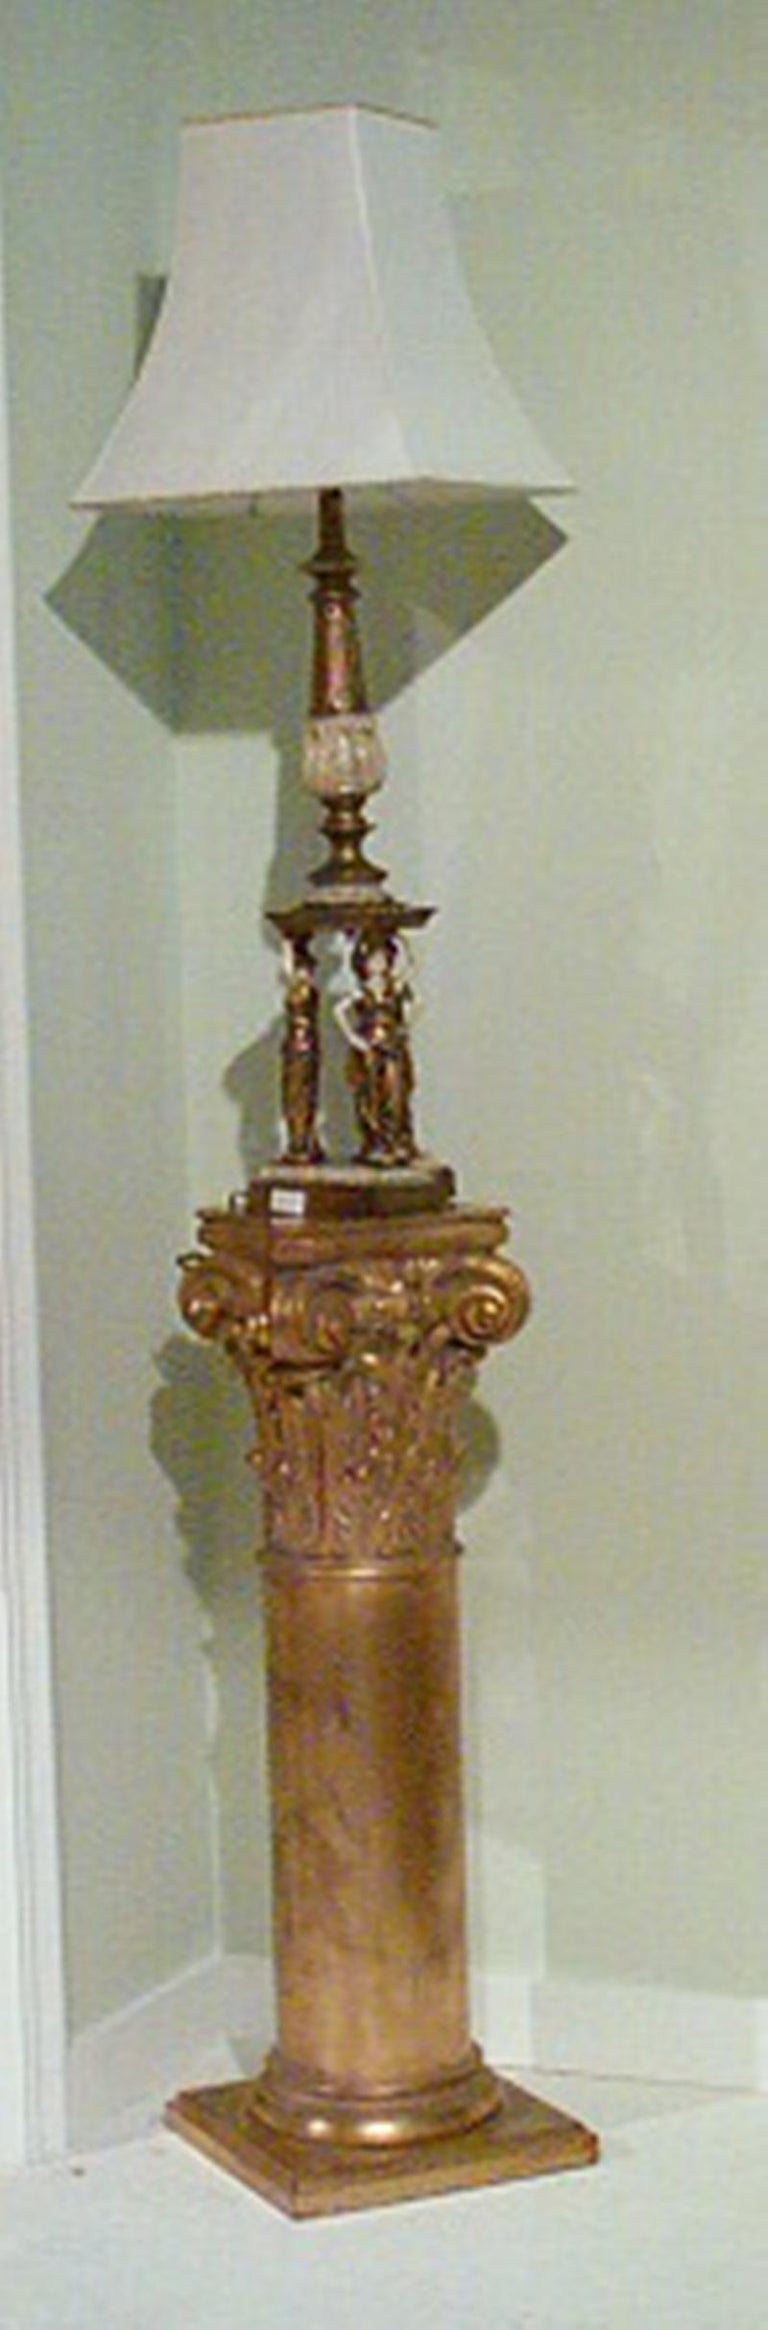 Neoclassical Neoclassic Pedestal, Flower Holder Column